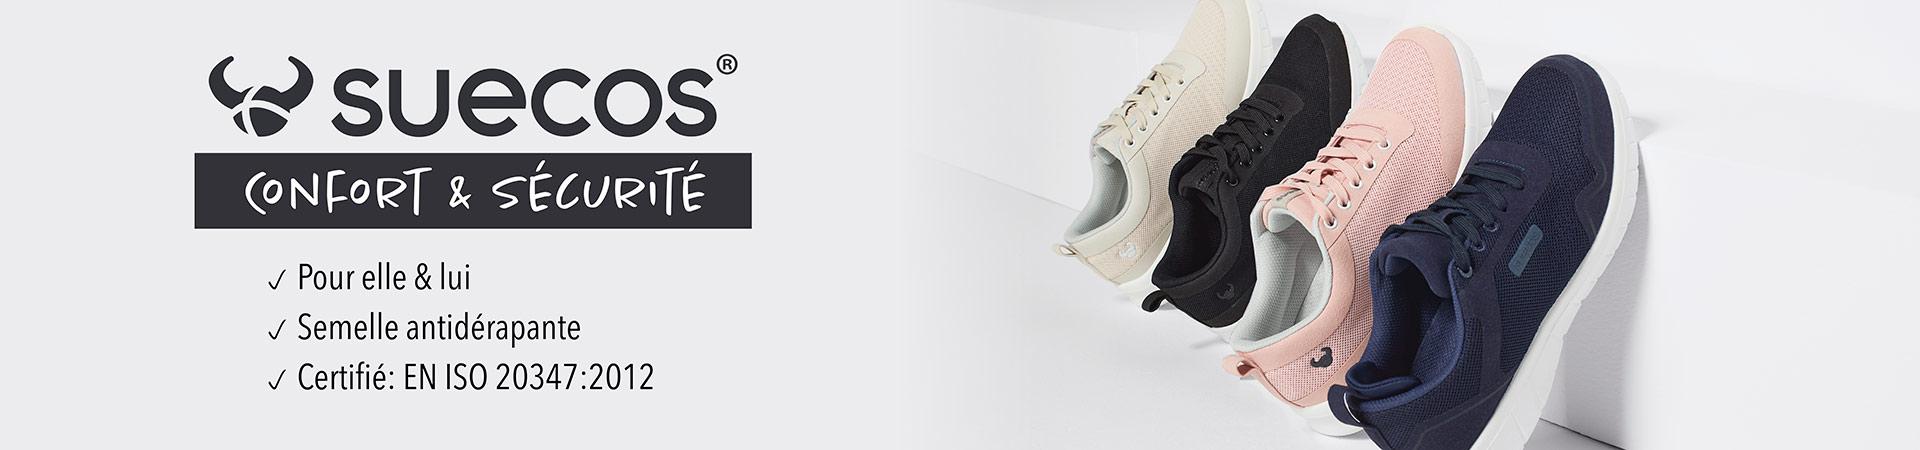 Chaussures antidérapante de suecos